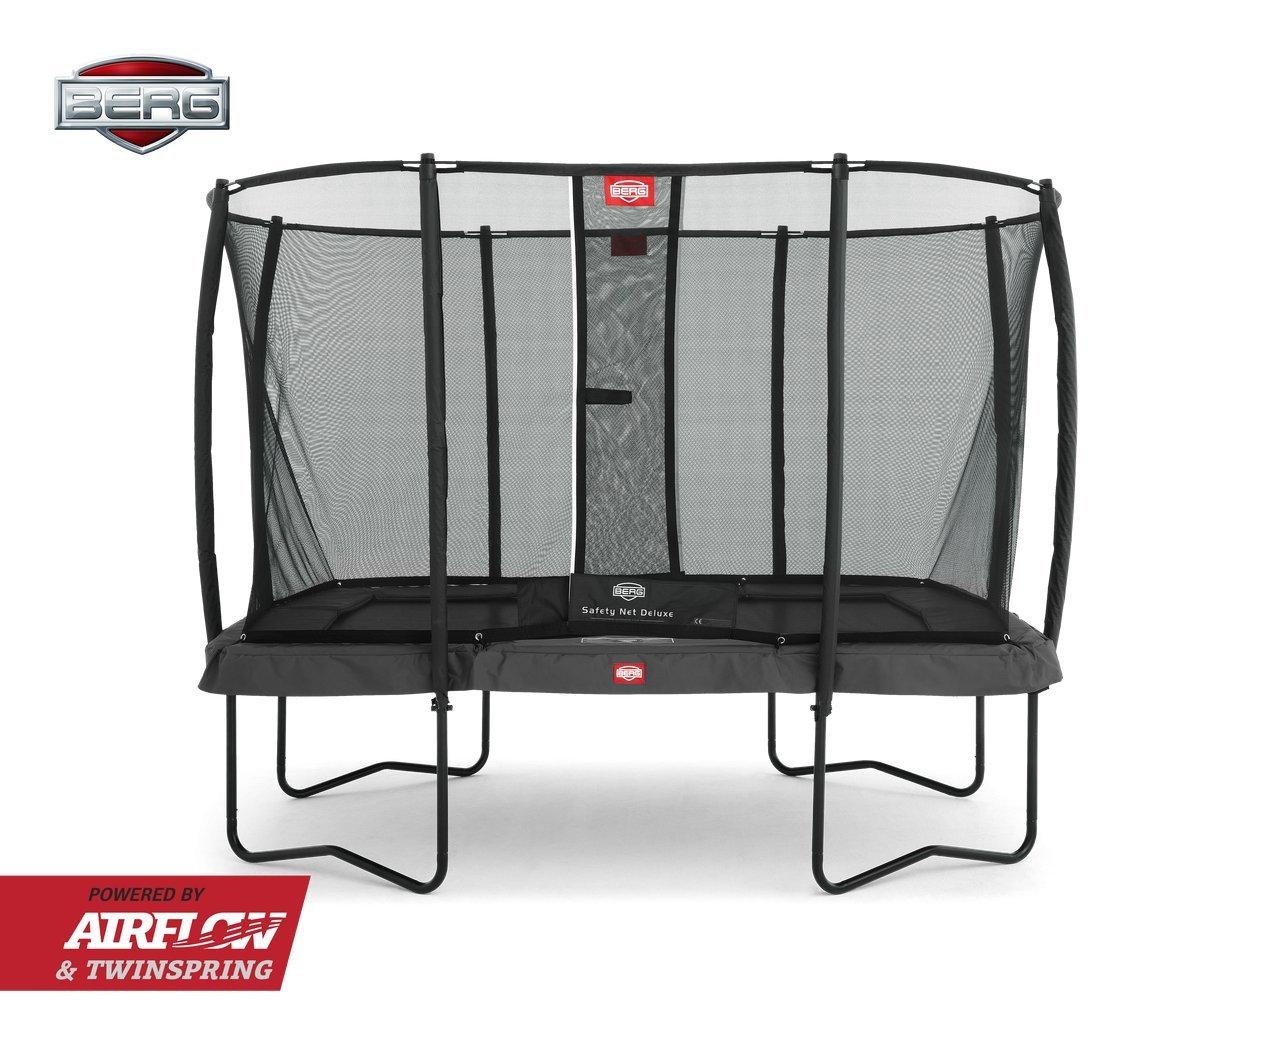 Berg® Trampolin EazyFit mit Sicherheitsnetz Deluxe, Randbezug Grau